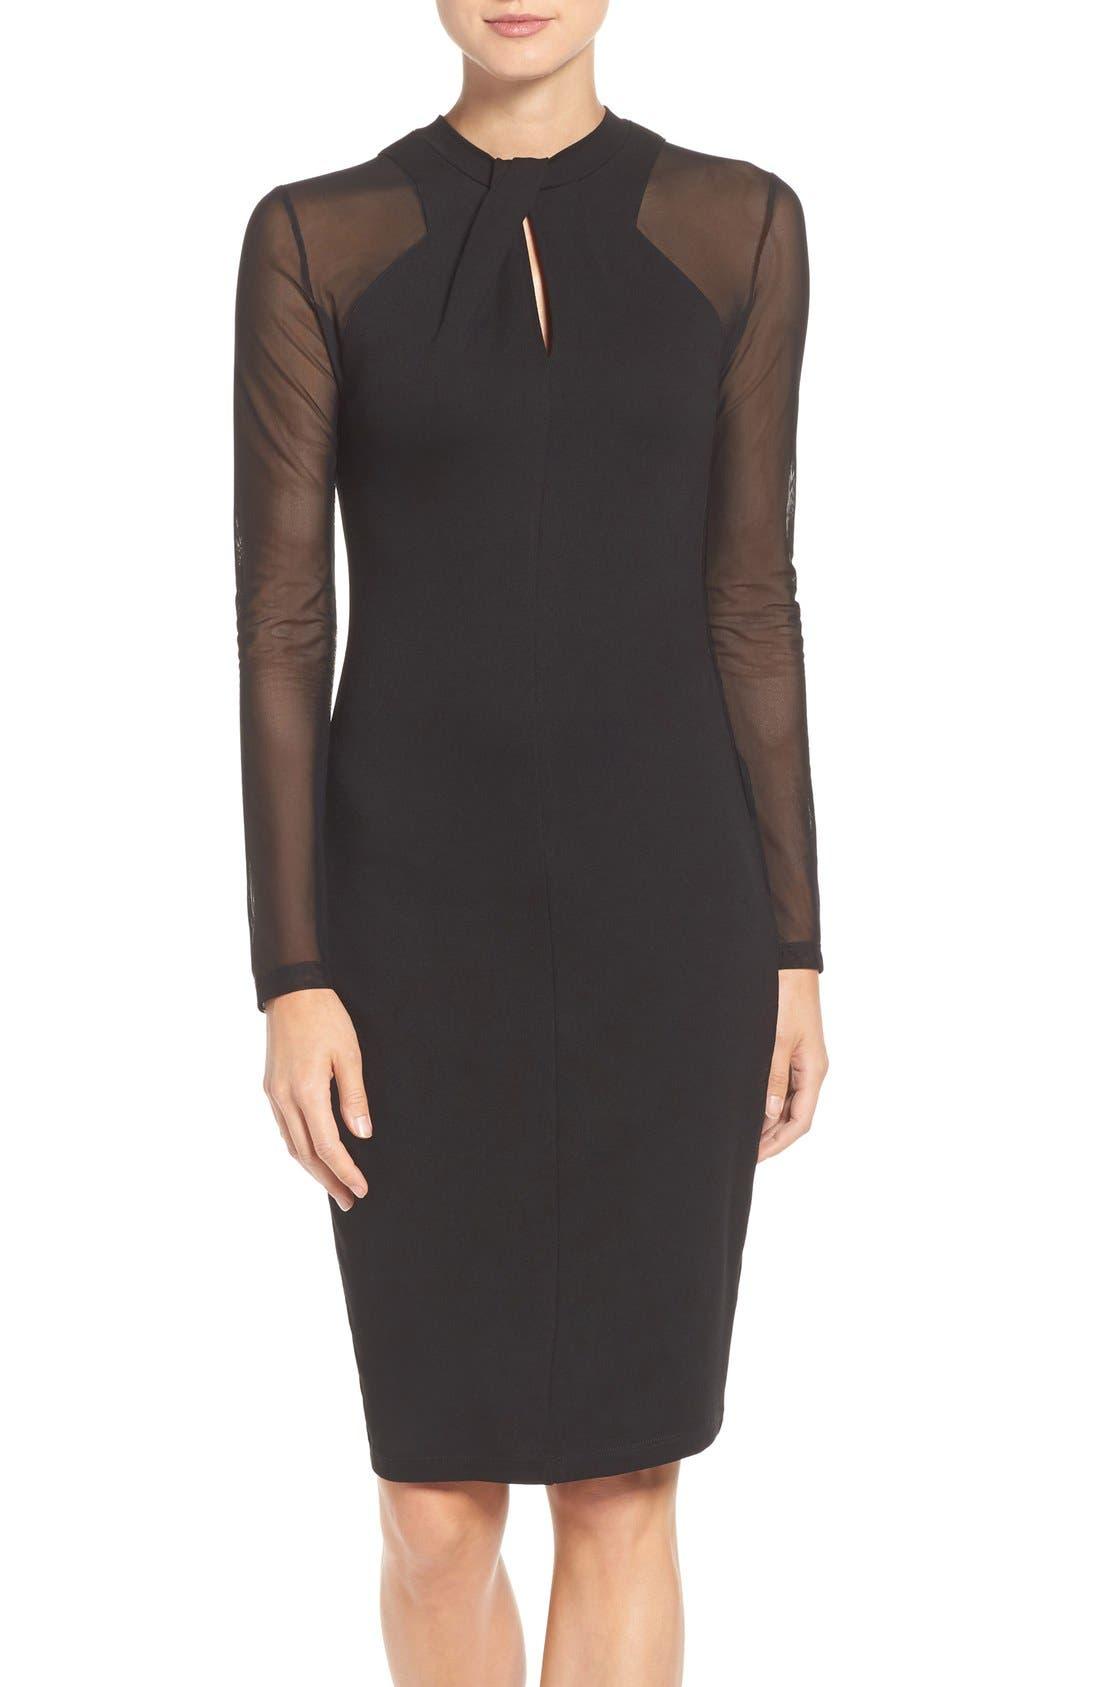 French Connection 'Tania Tuck' Mesh Sleeve Sheath Dress